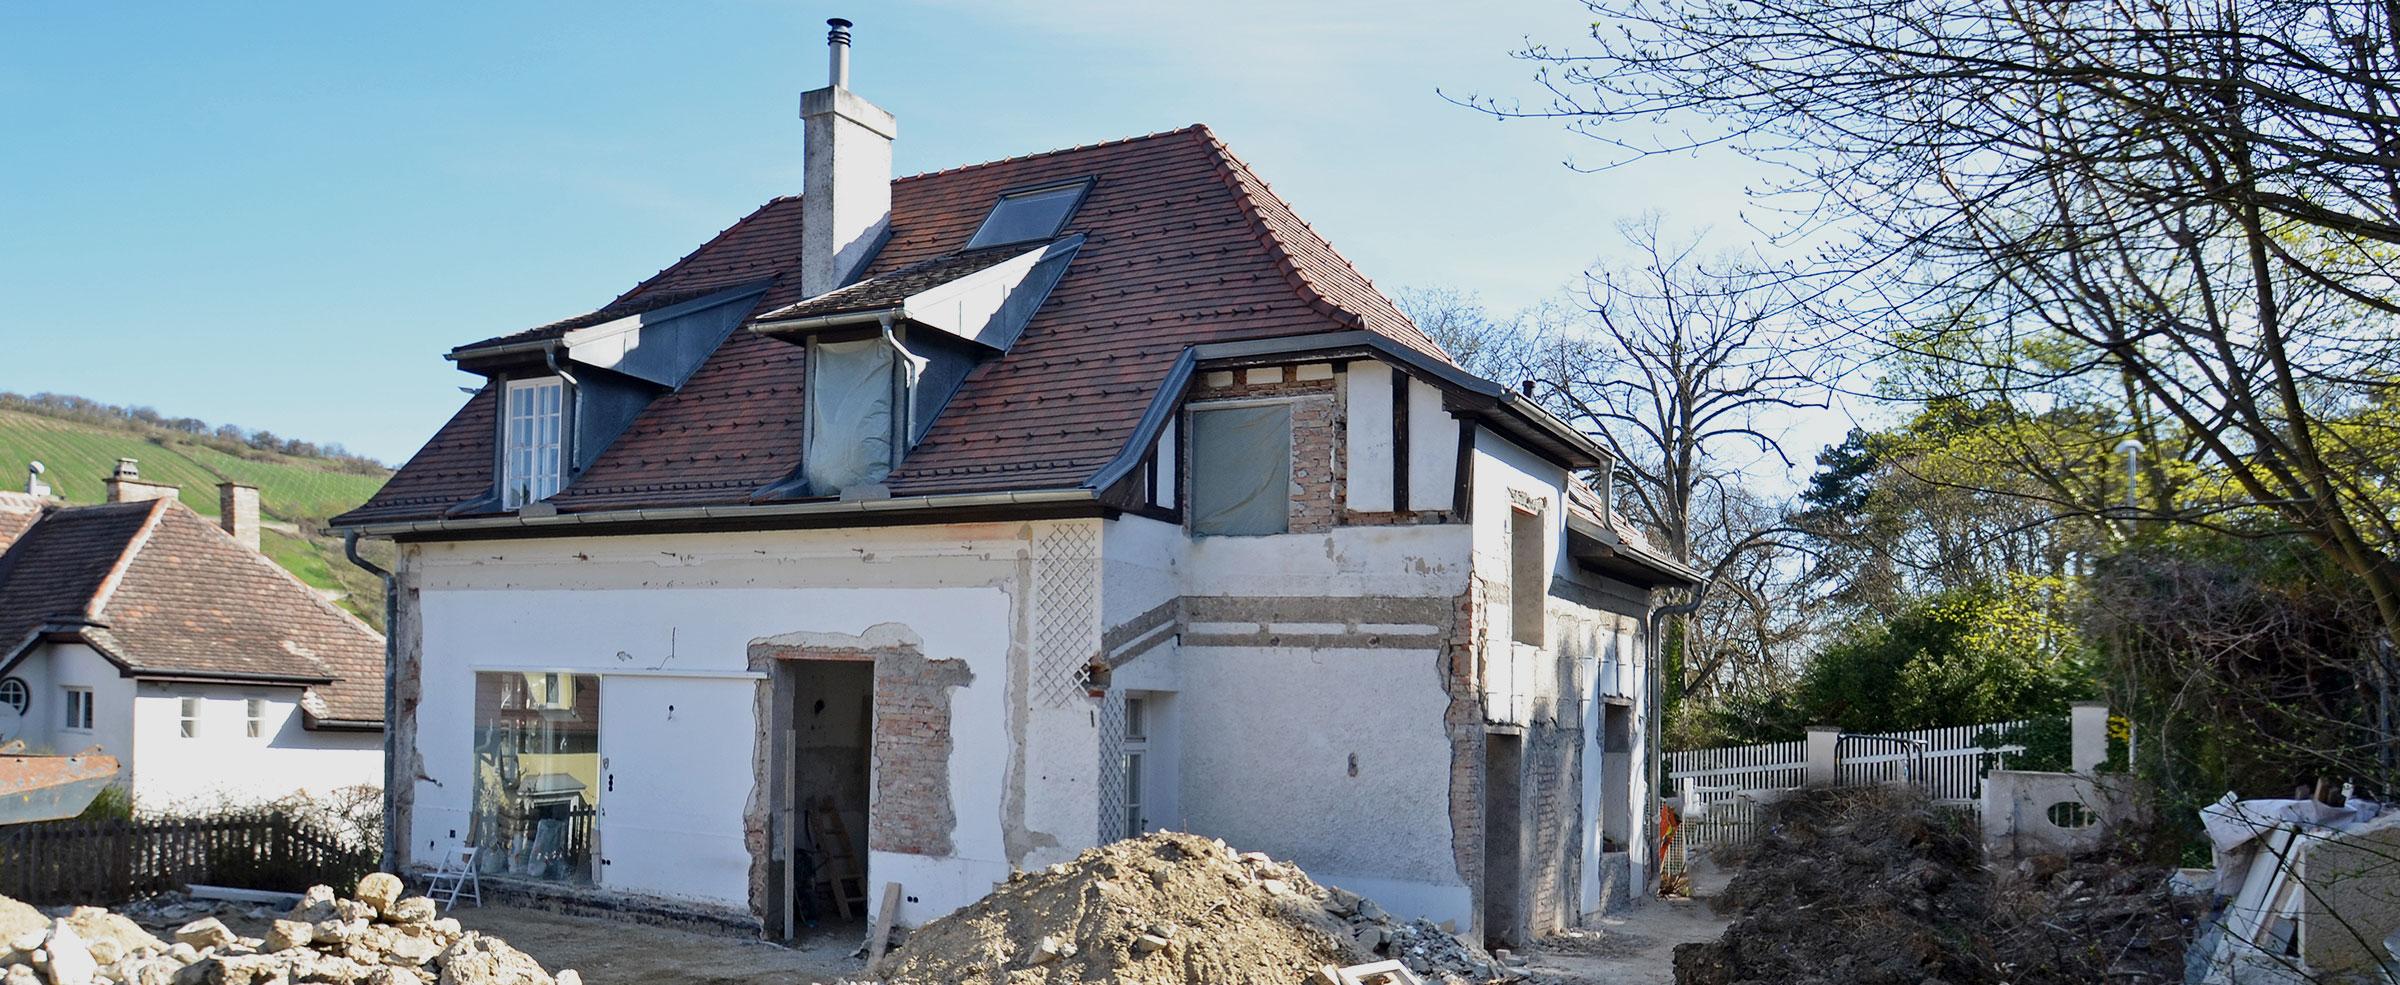 Sanierung Denkmalschutz, Denkmalschutz Sanierung